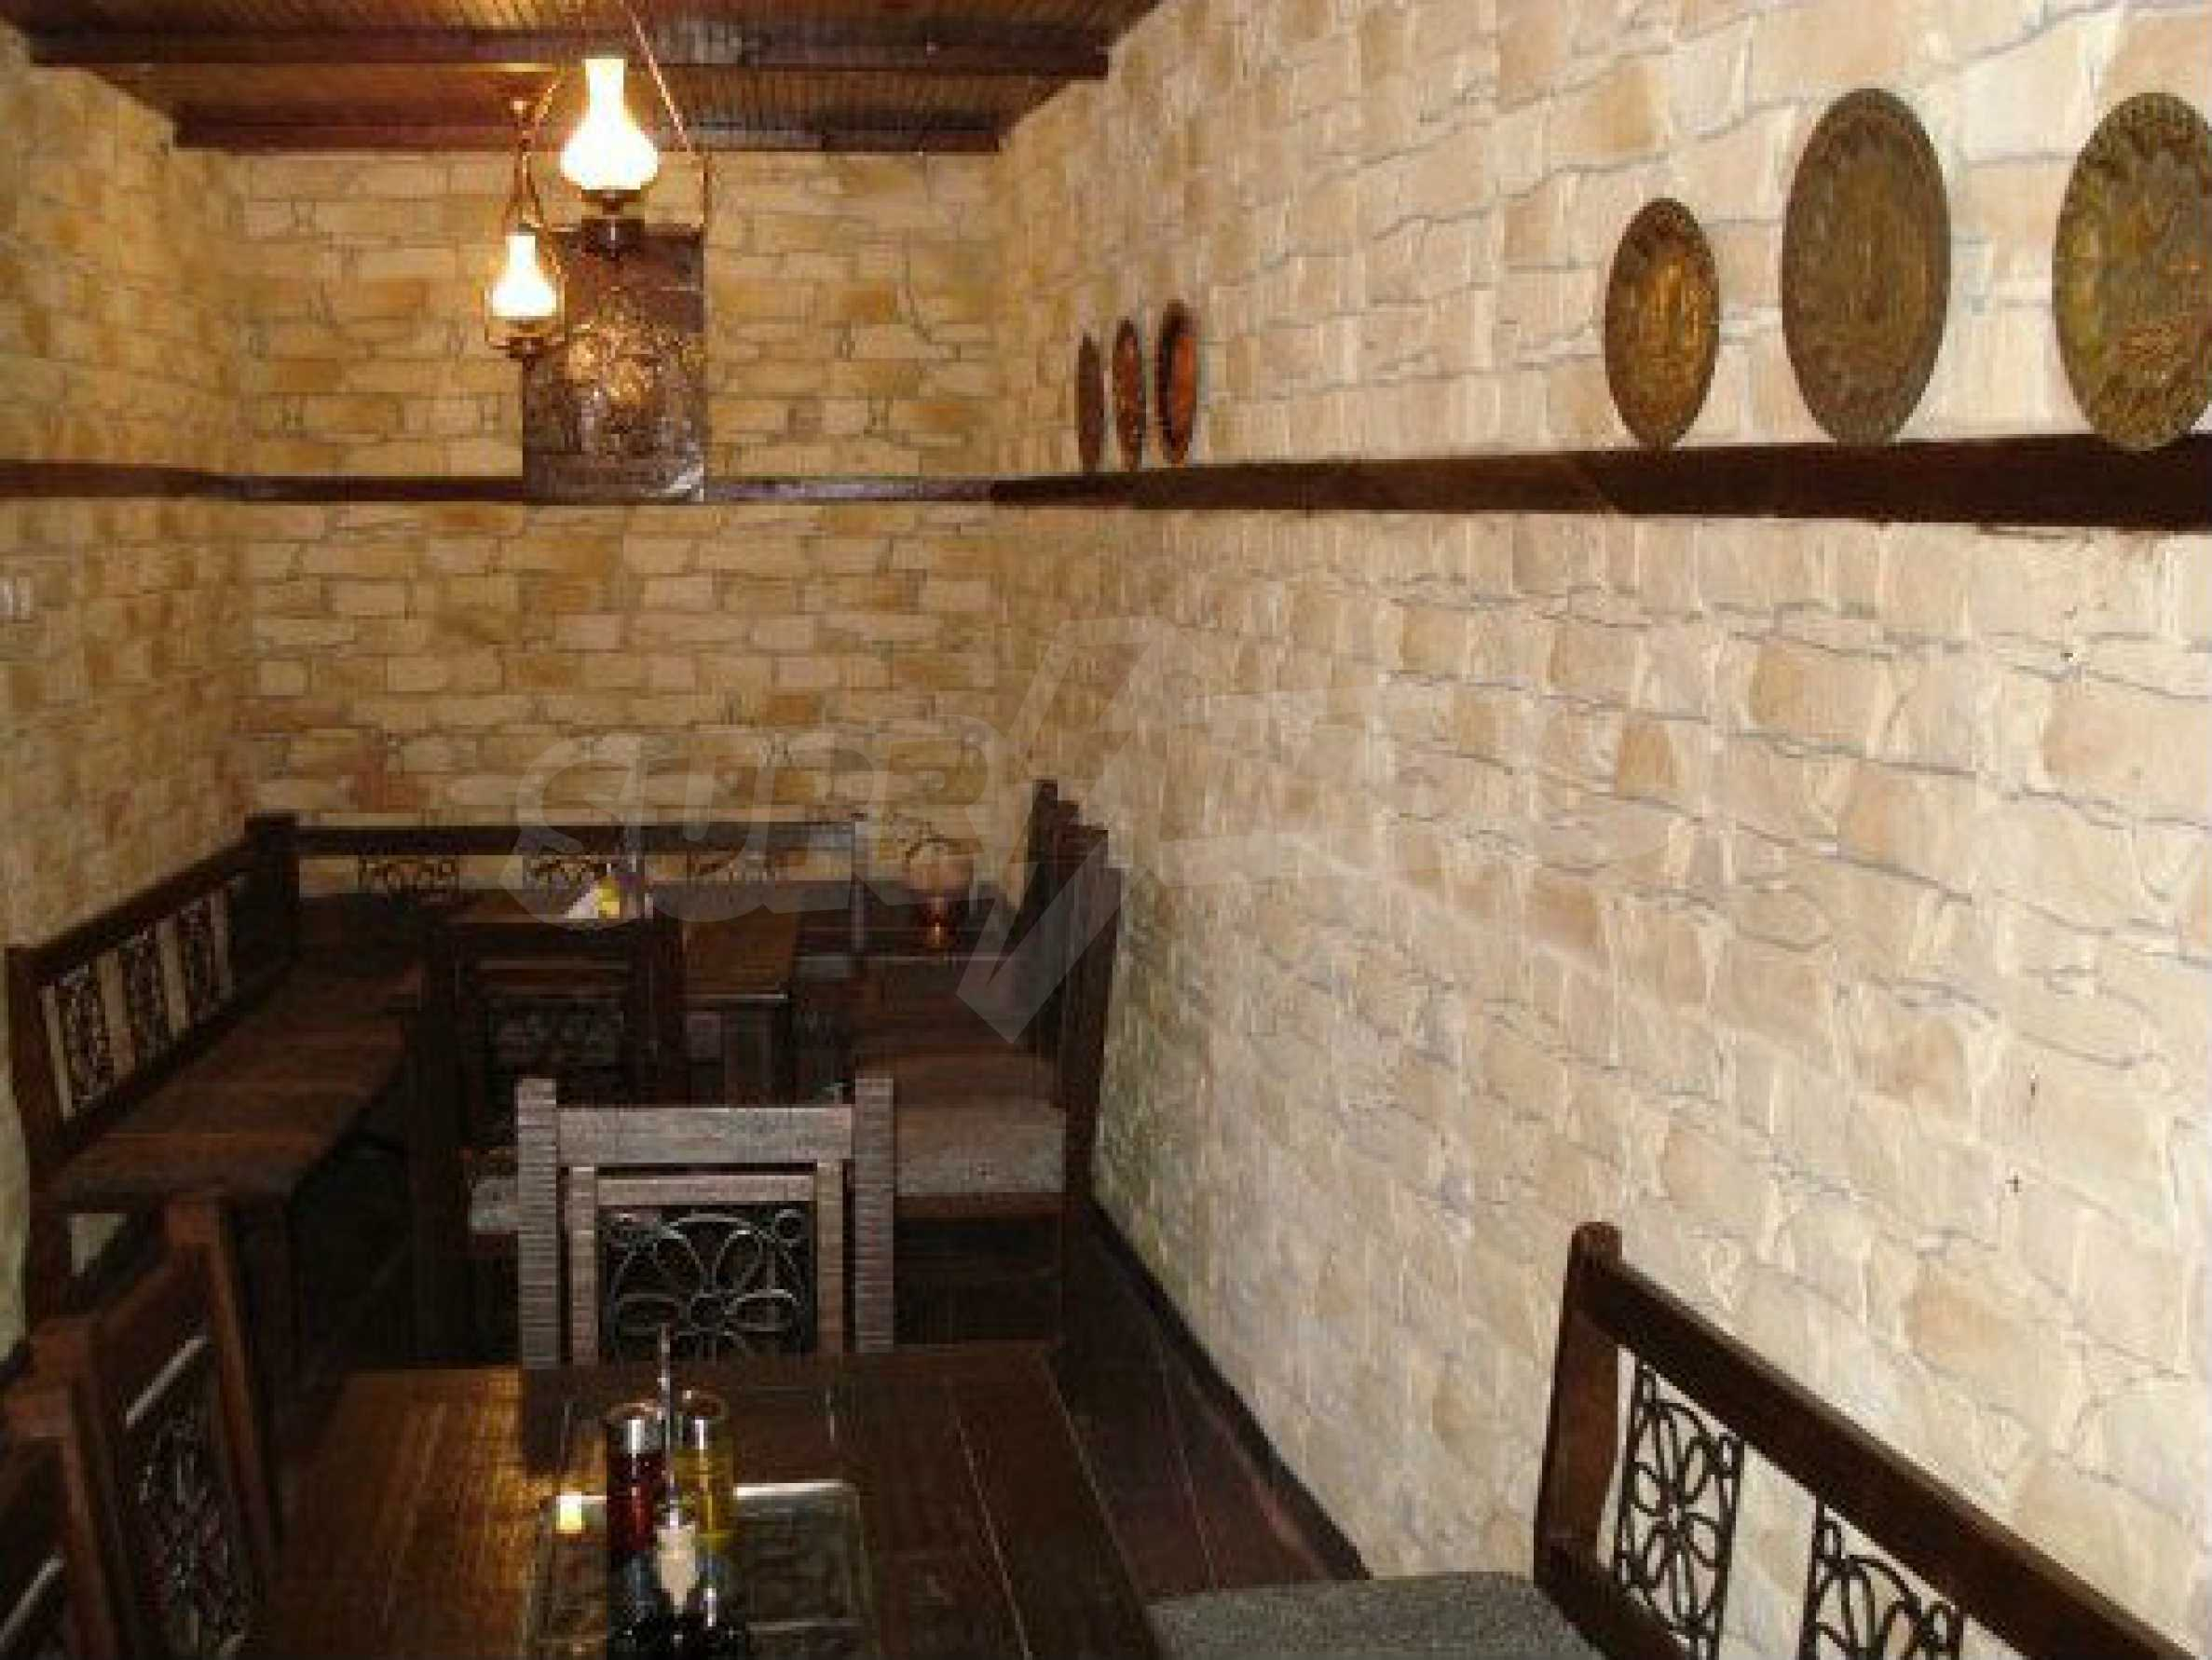 Hotelanlage mit Restaurant am Ufer des Flusses Osam in Lovech 56